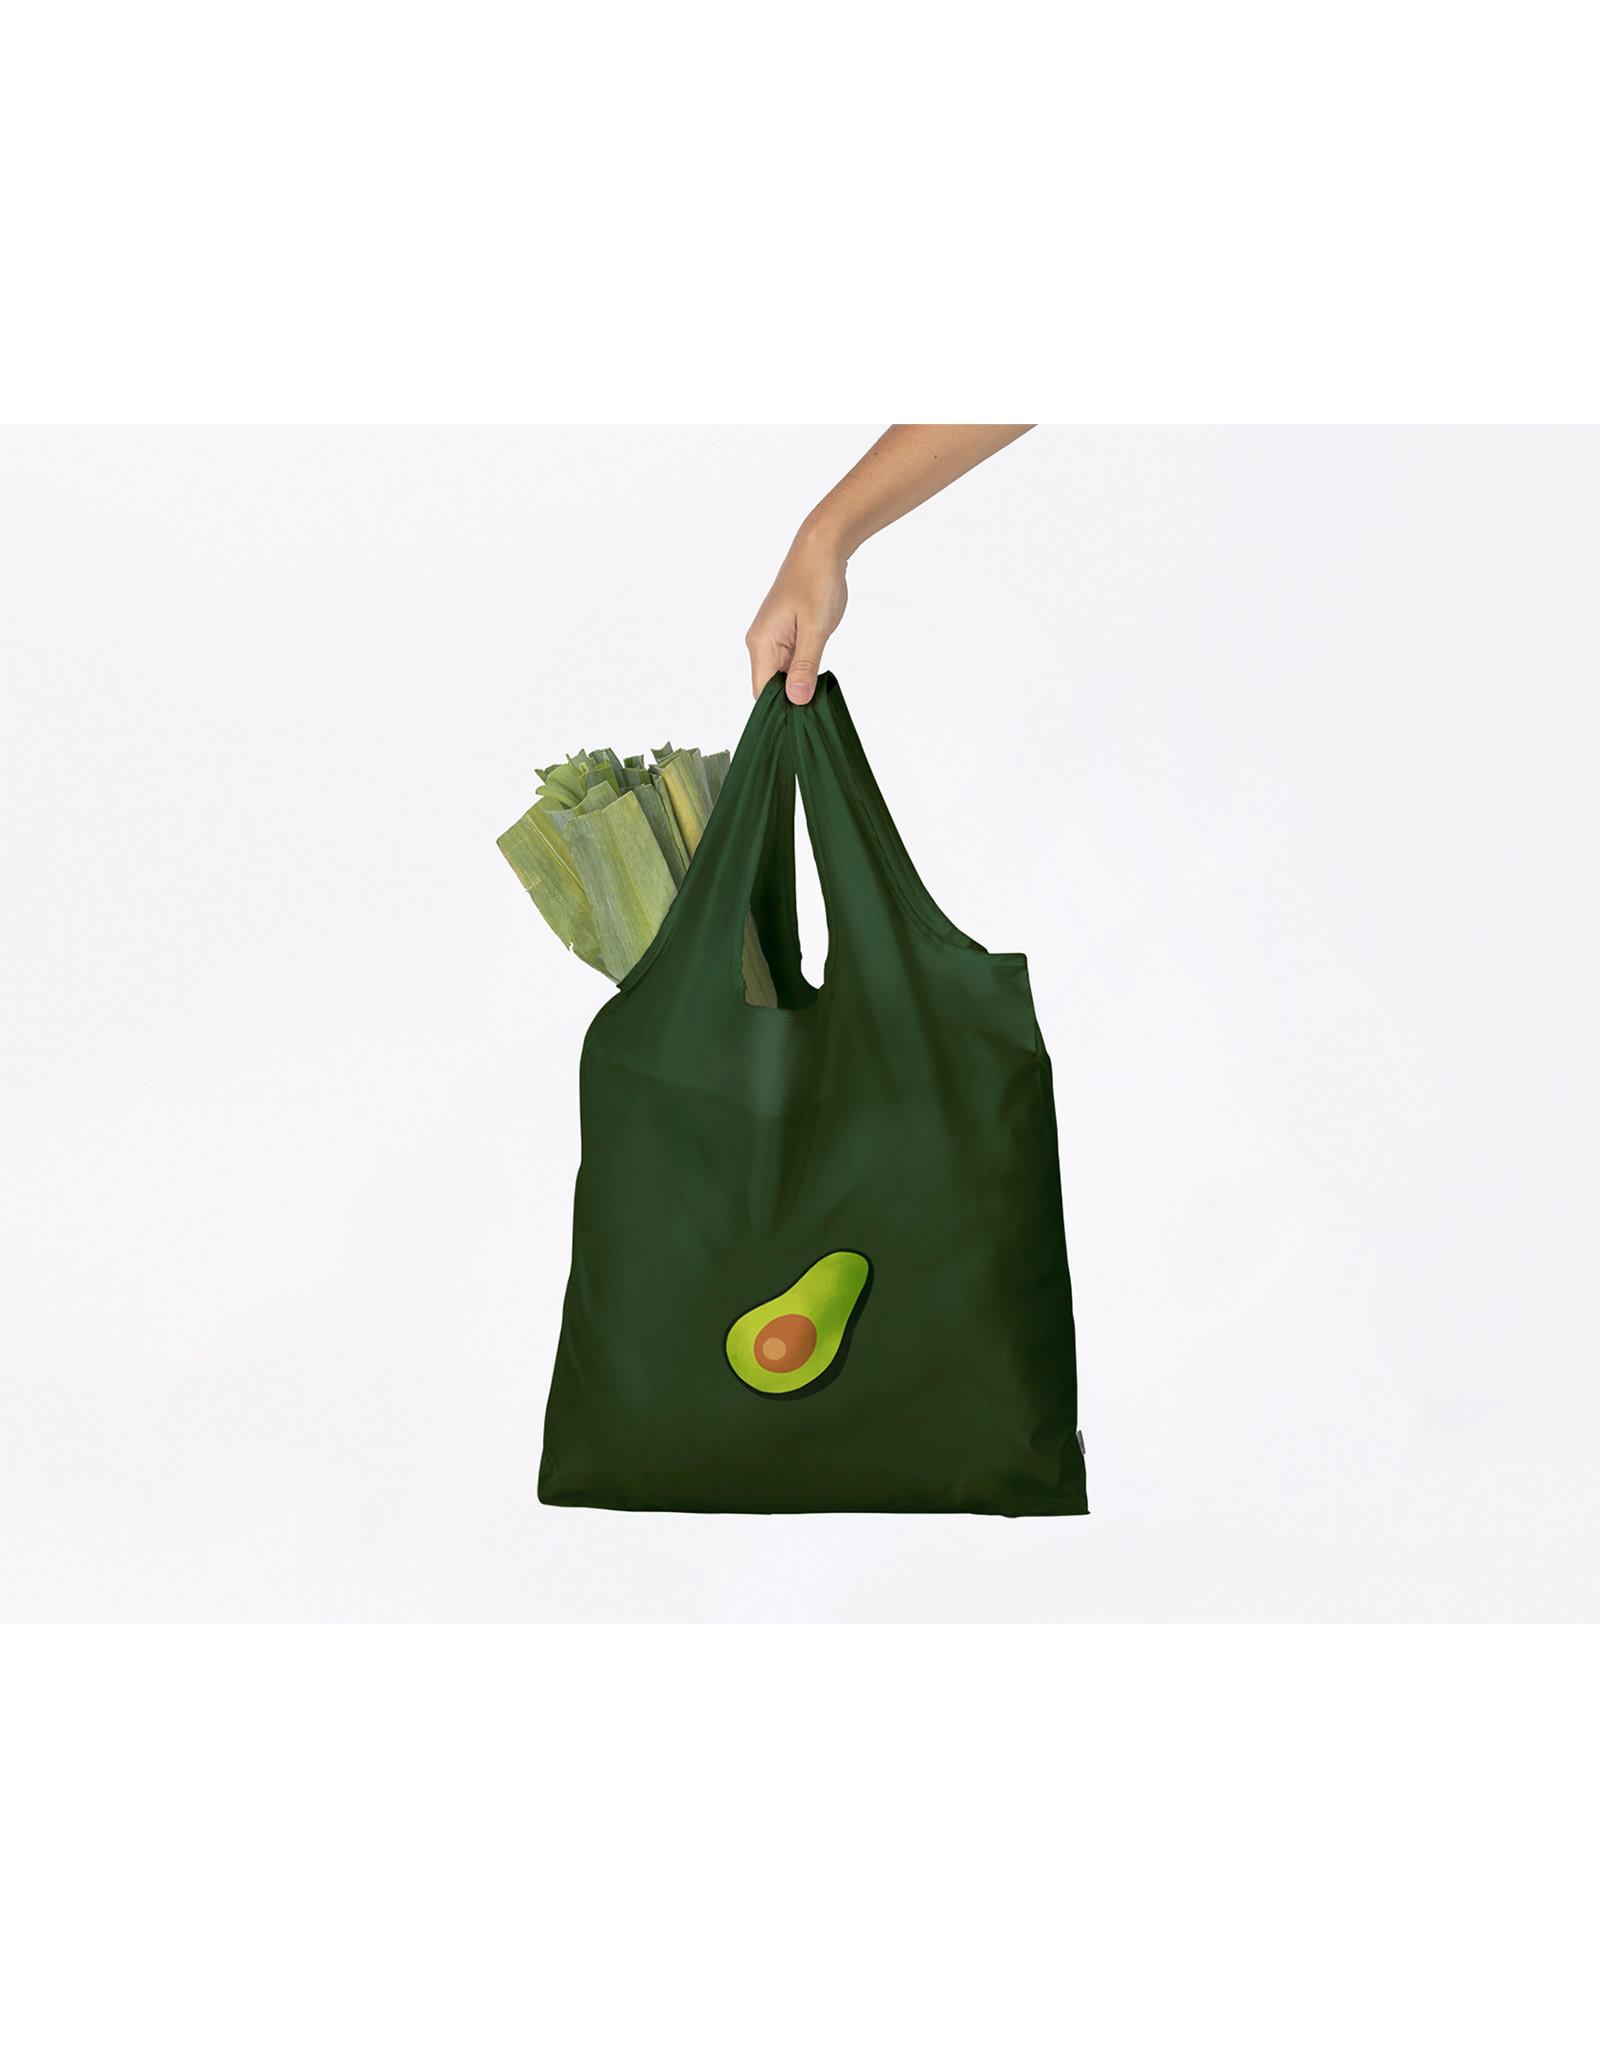 DOY - Reusable Avocado Tote